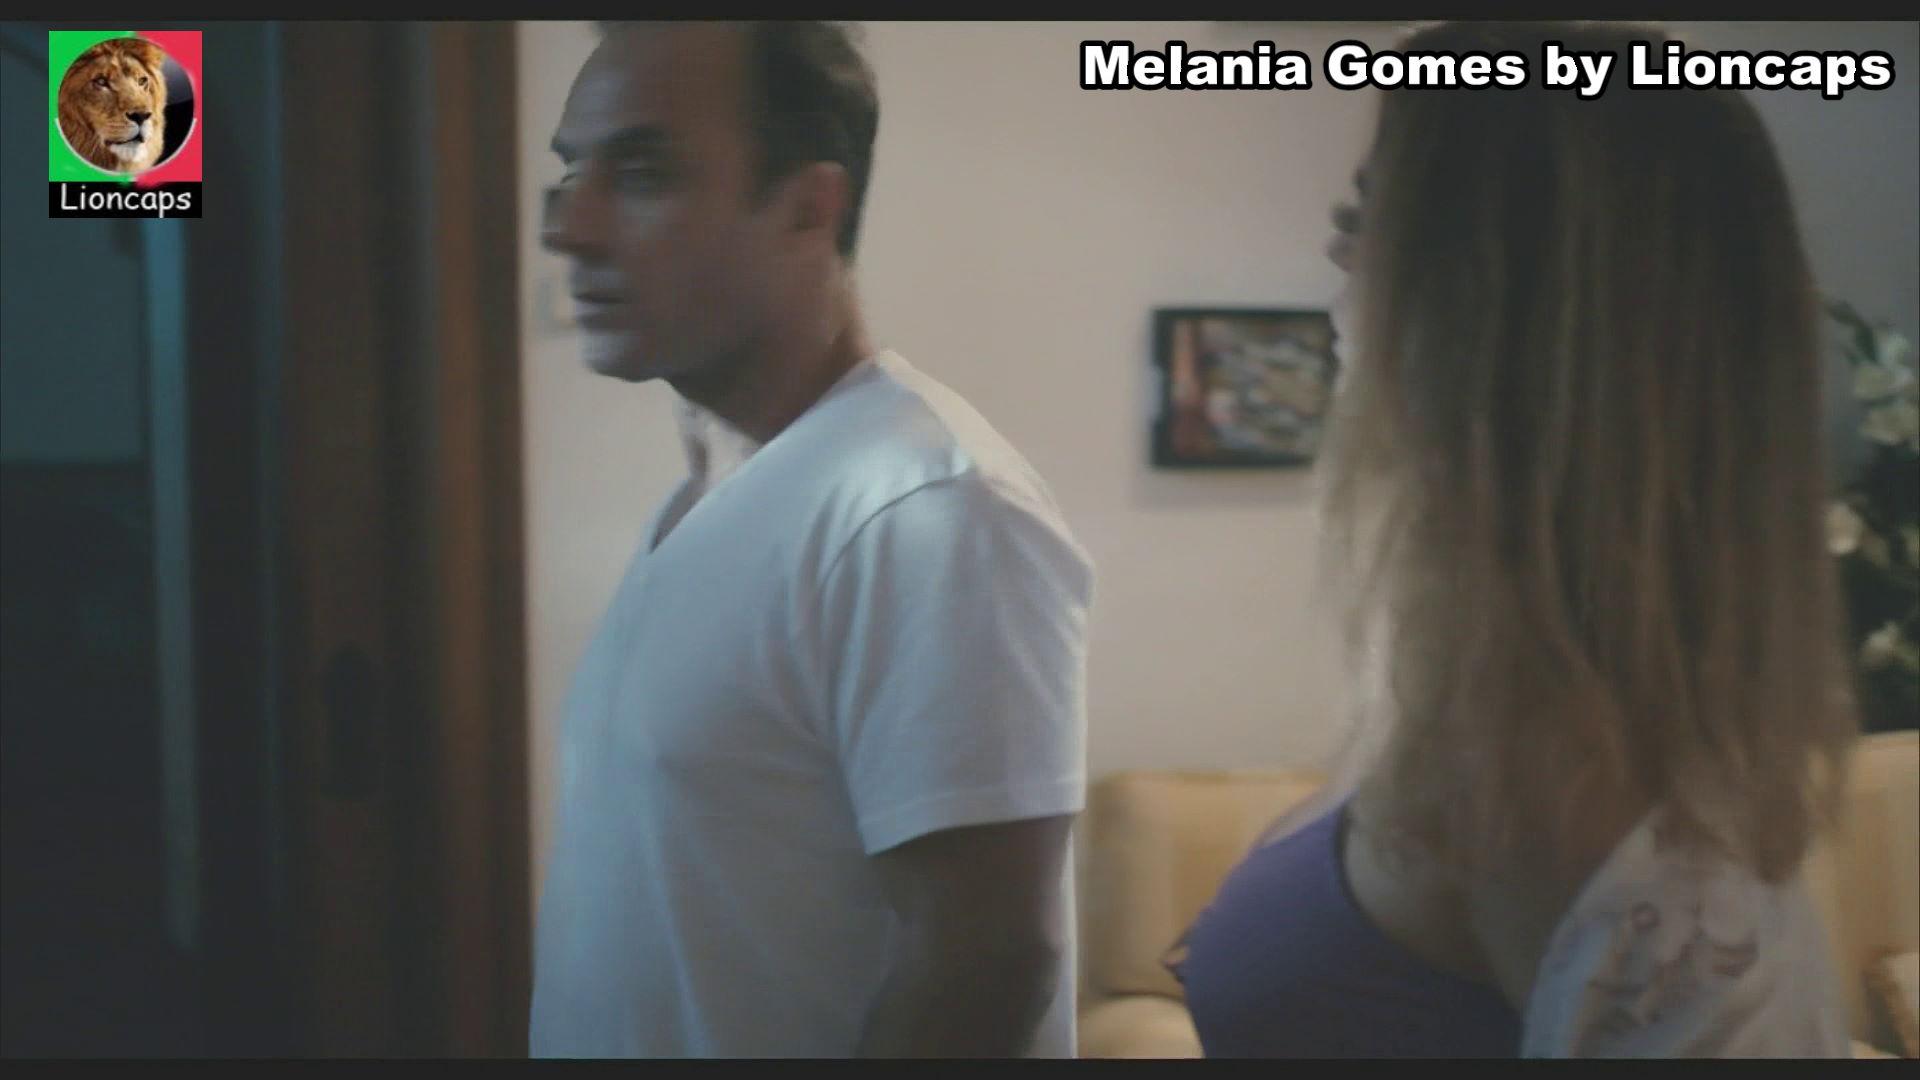 726648321_melania_gomes_vs190831_1088_122_85lo.JPG